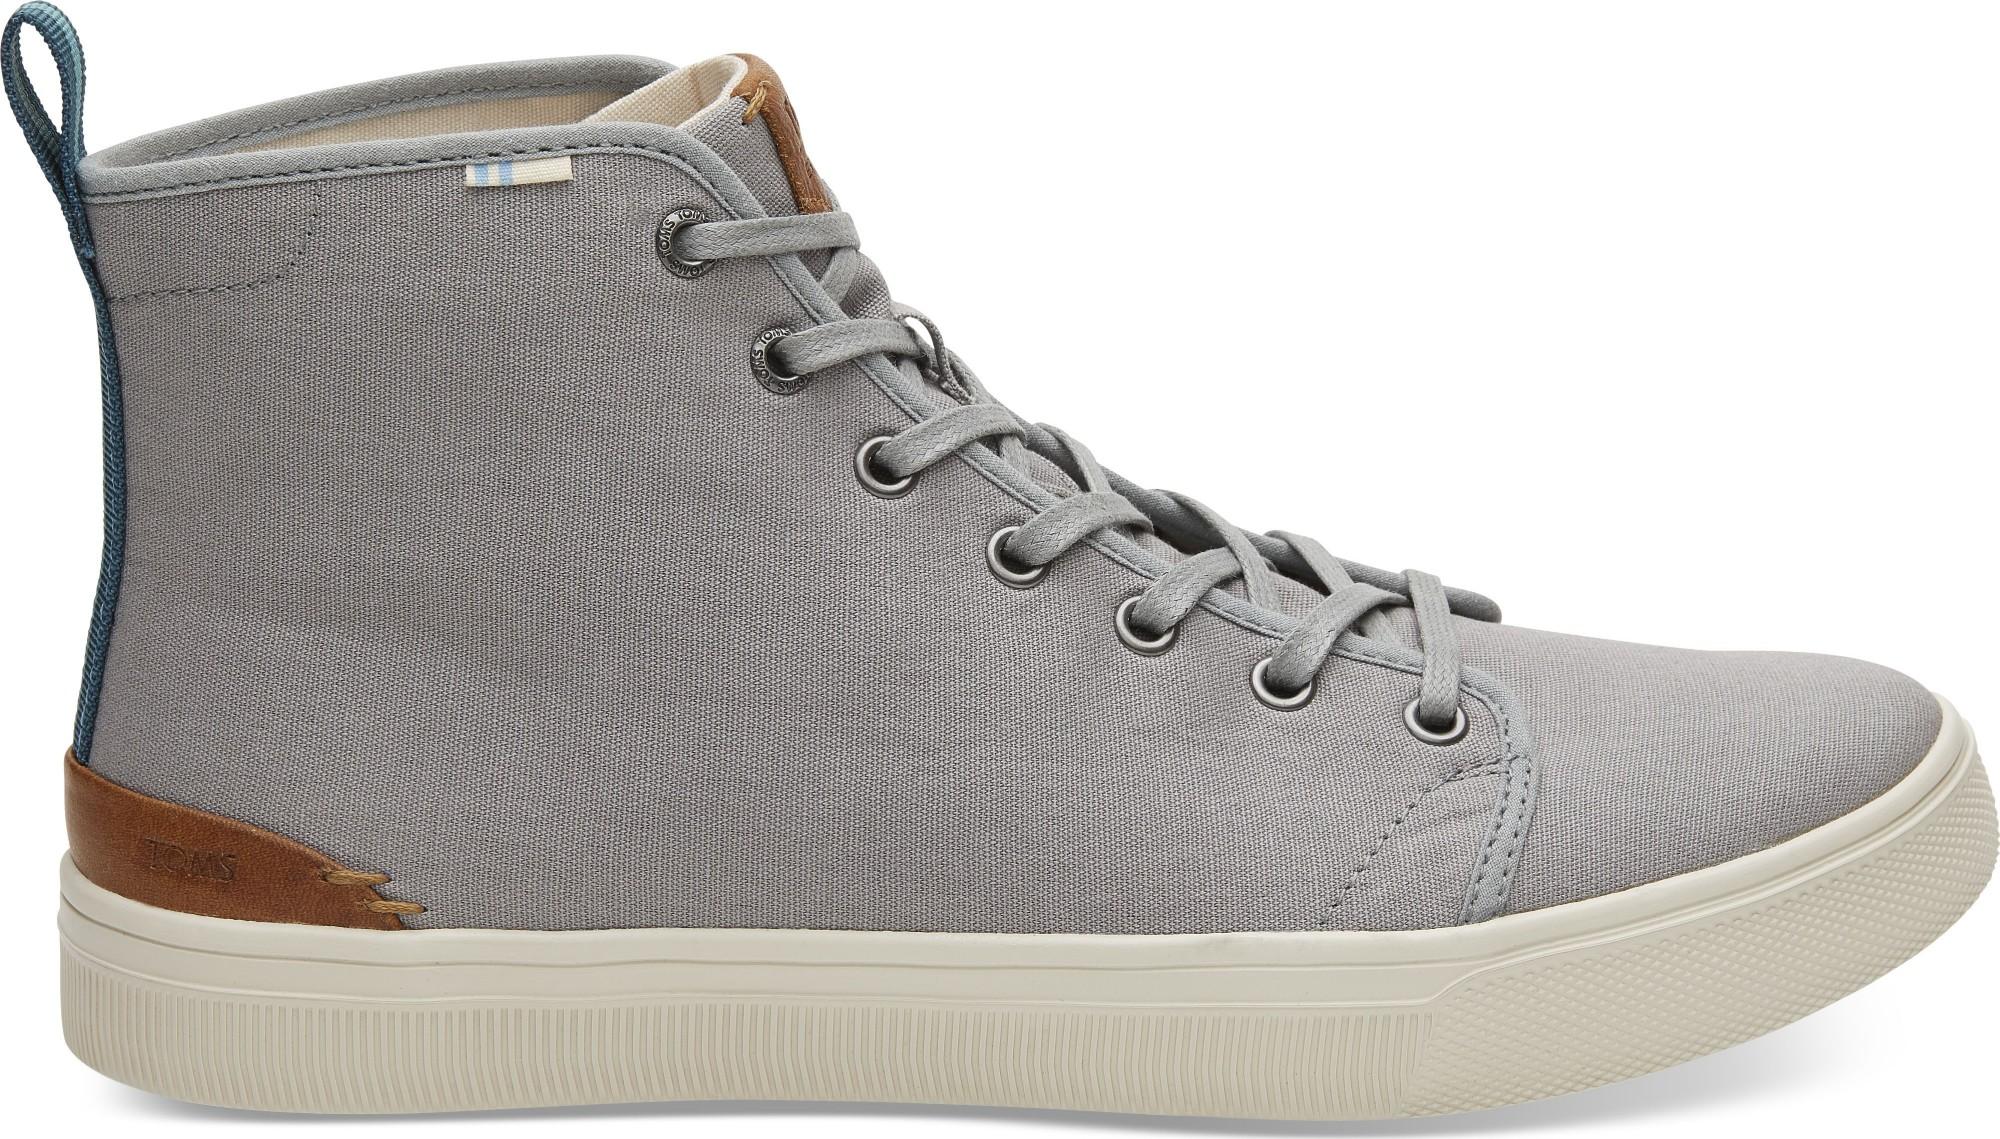 TOMS Canvas Men's Trvl Lite High Sneaker Neutral Gray 45